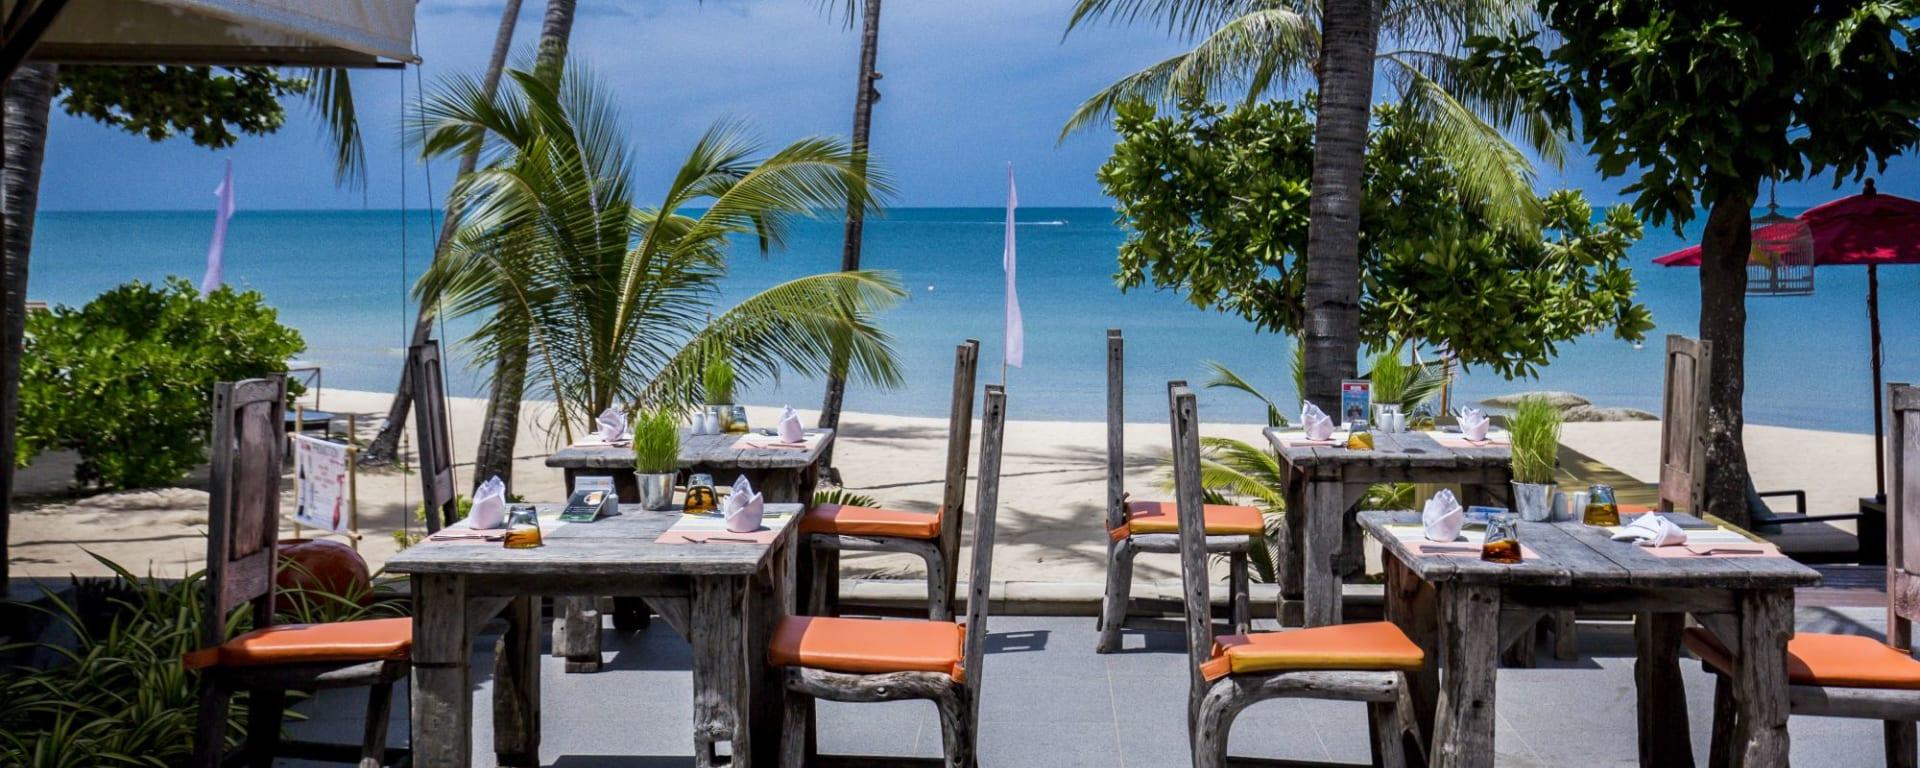 New Star Resort à Ko Samui: Restaurant Chill by the pool